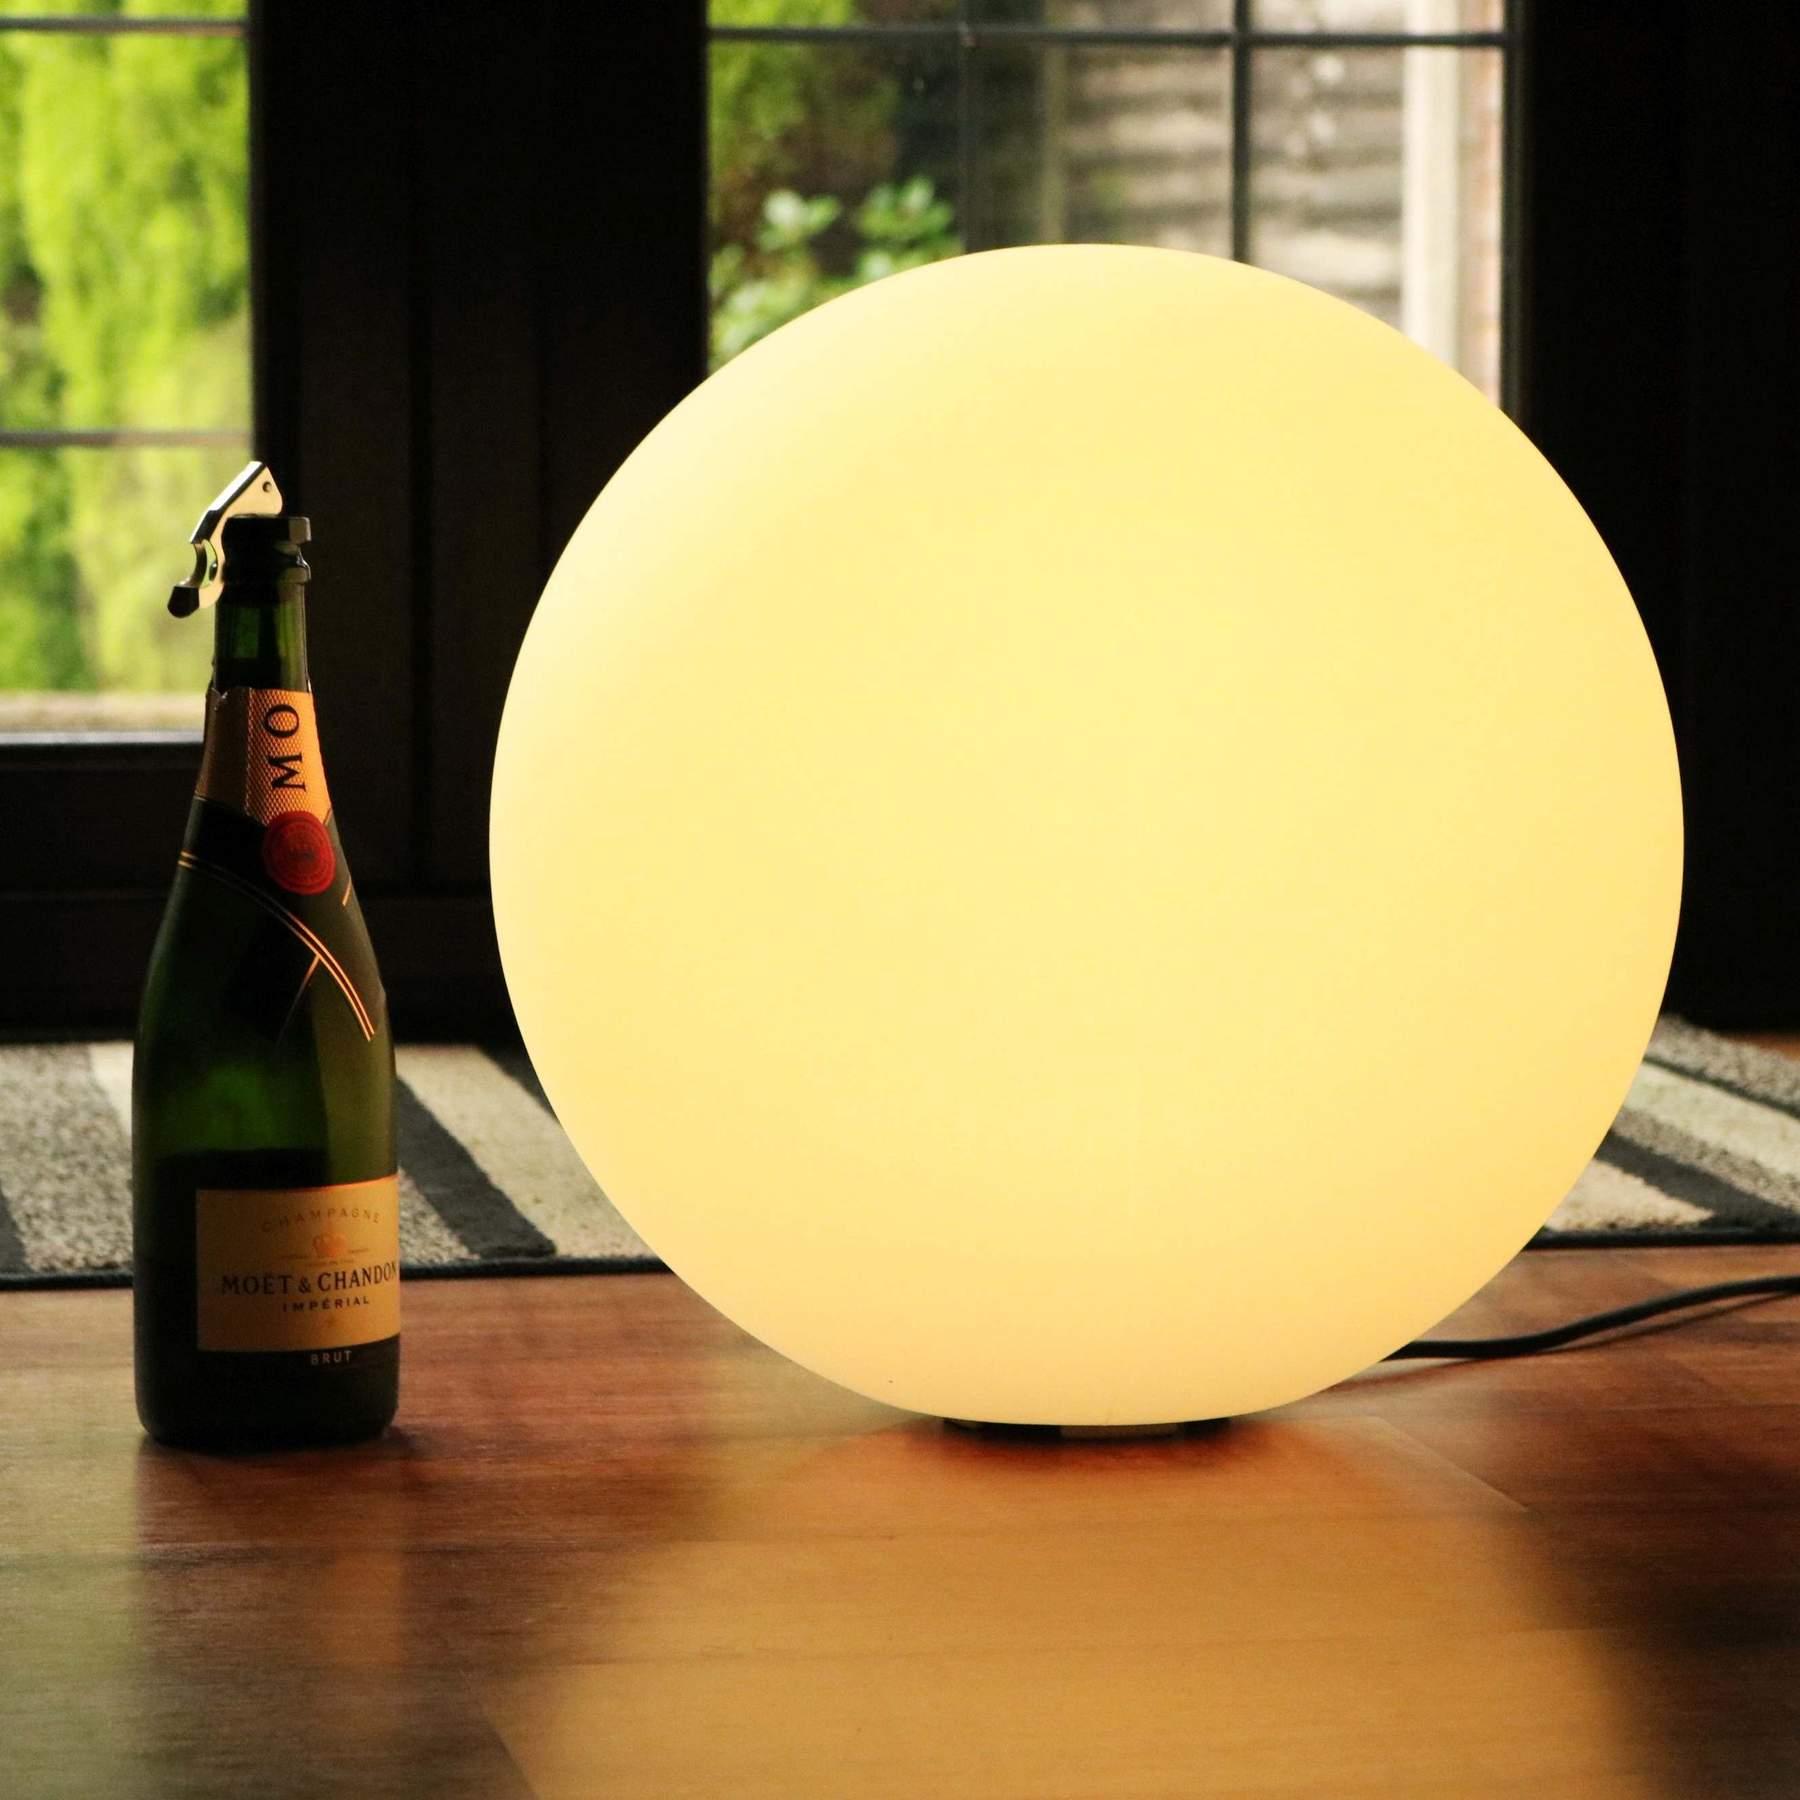 40 cm Outdoor Ball Lights, 15.7 Inch Floor Lighting Balls, Floating Pool LED Balls